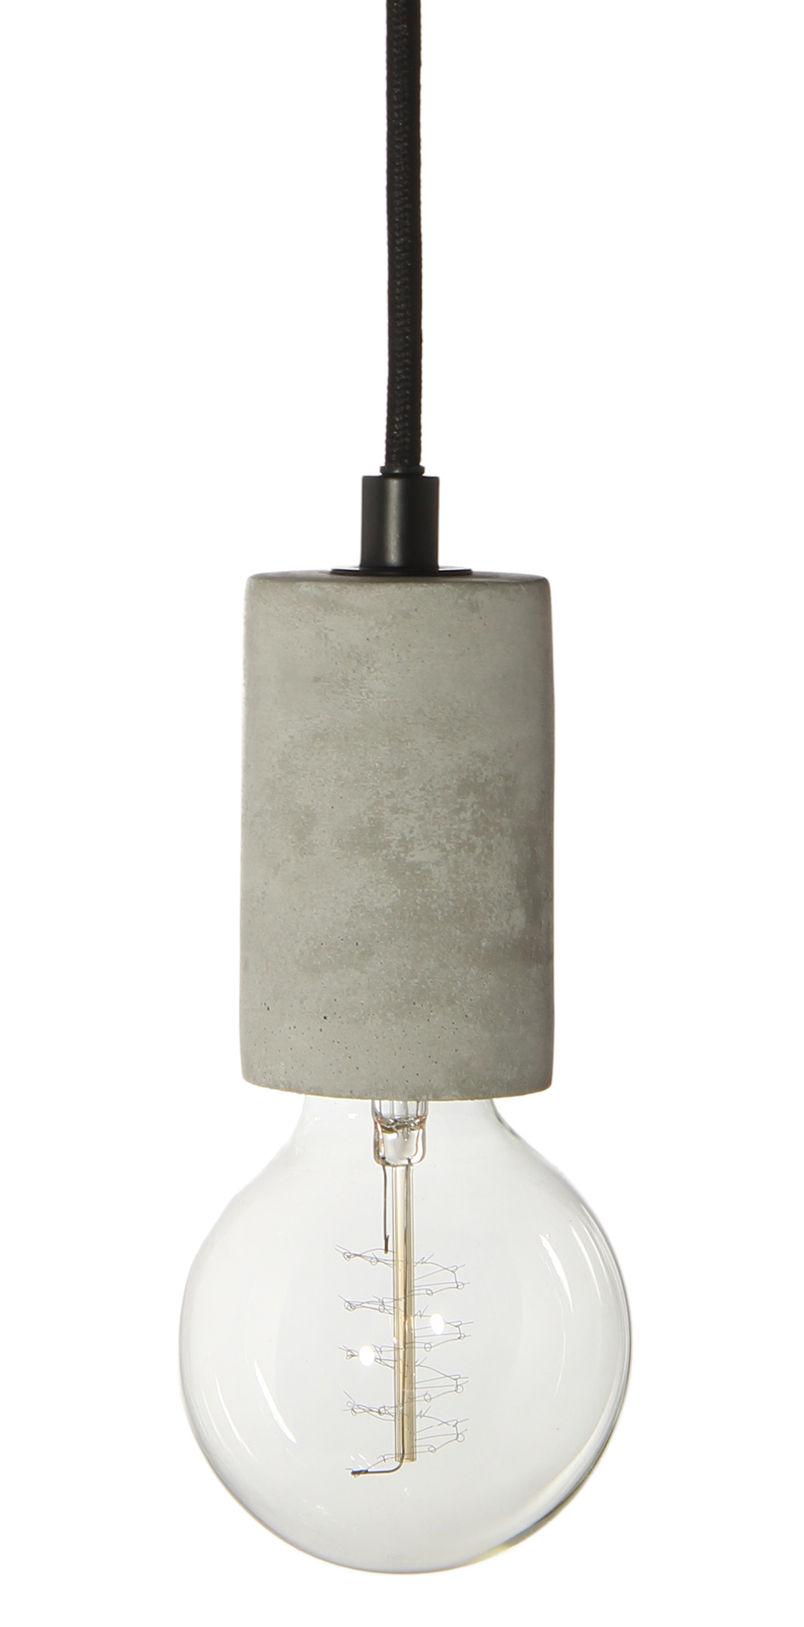 Luminaire - Suspensions - Suspension Bristol / Béton - Frandsen - Béton / Câble noir - Béton, Tissu